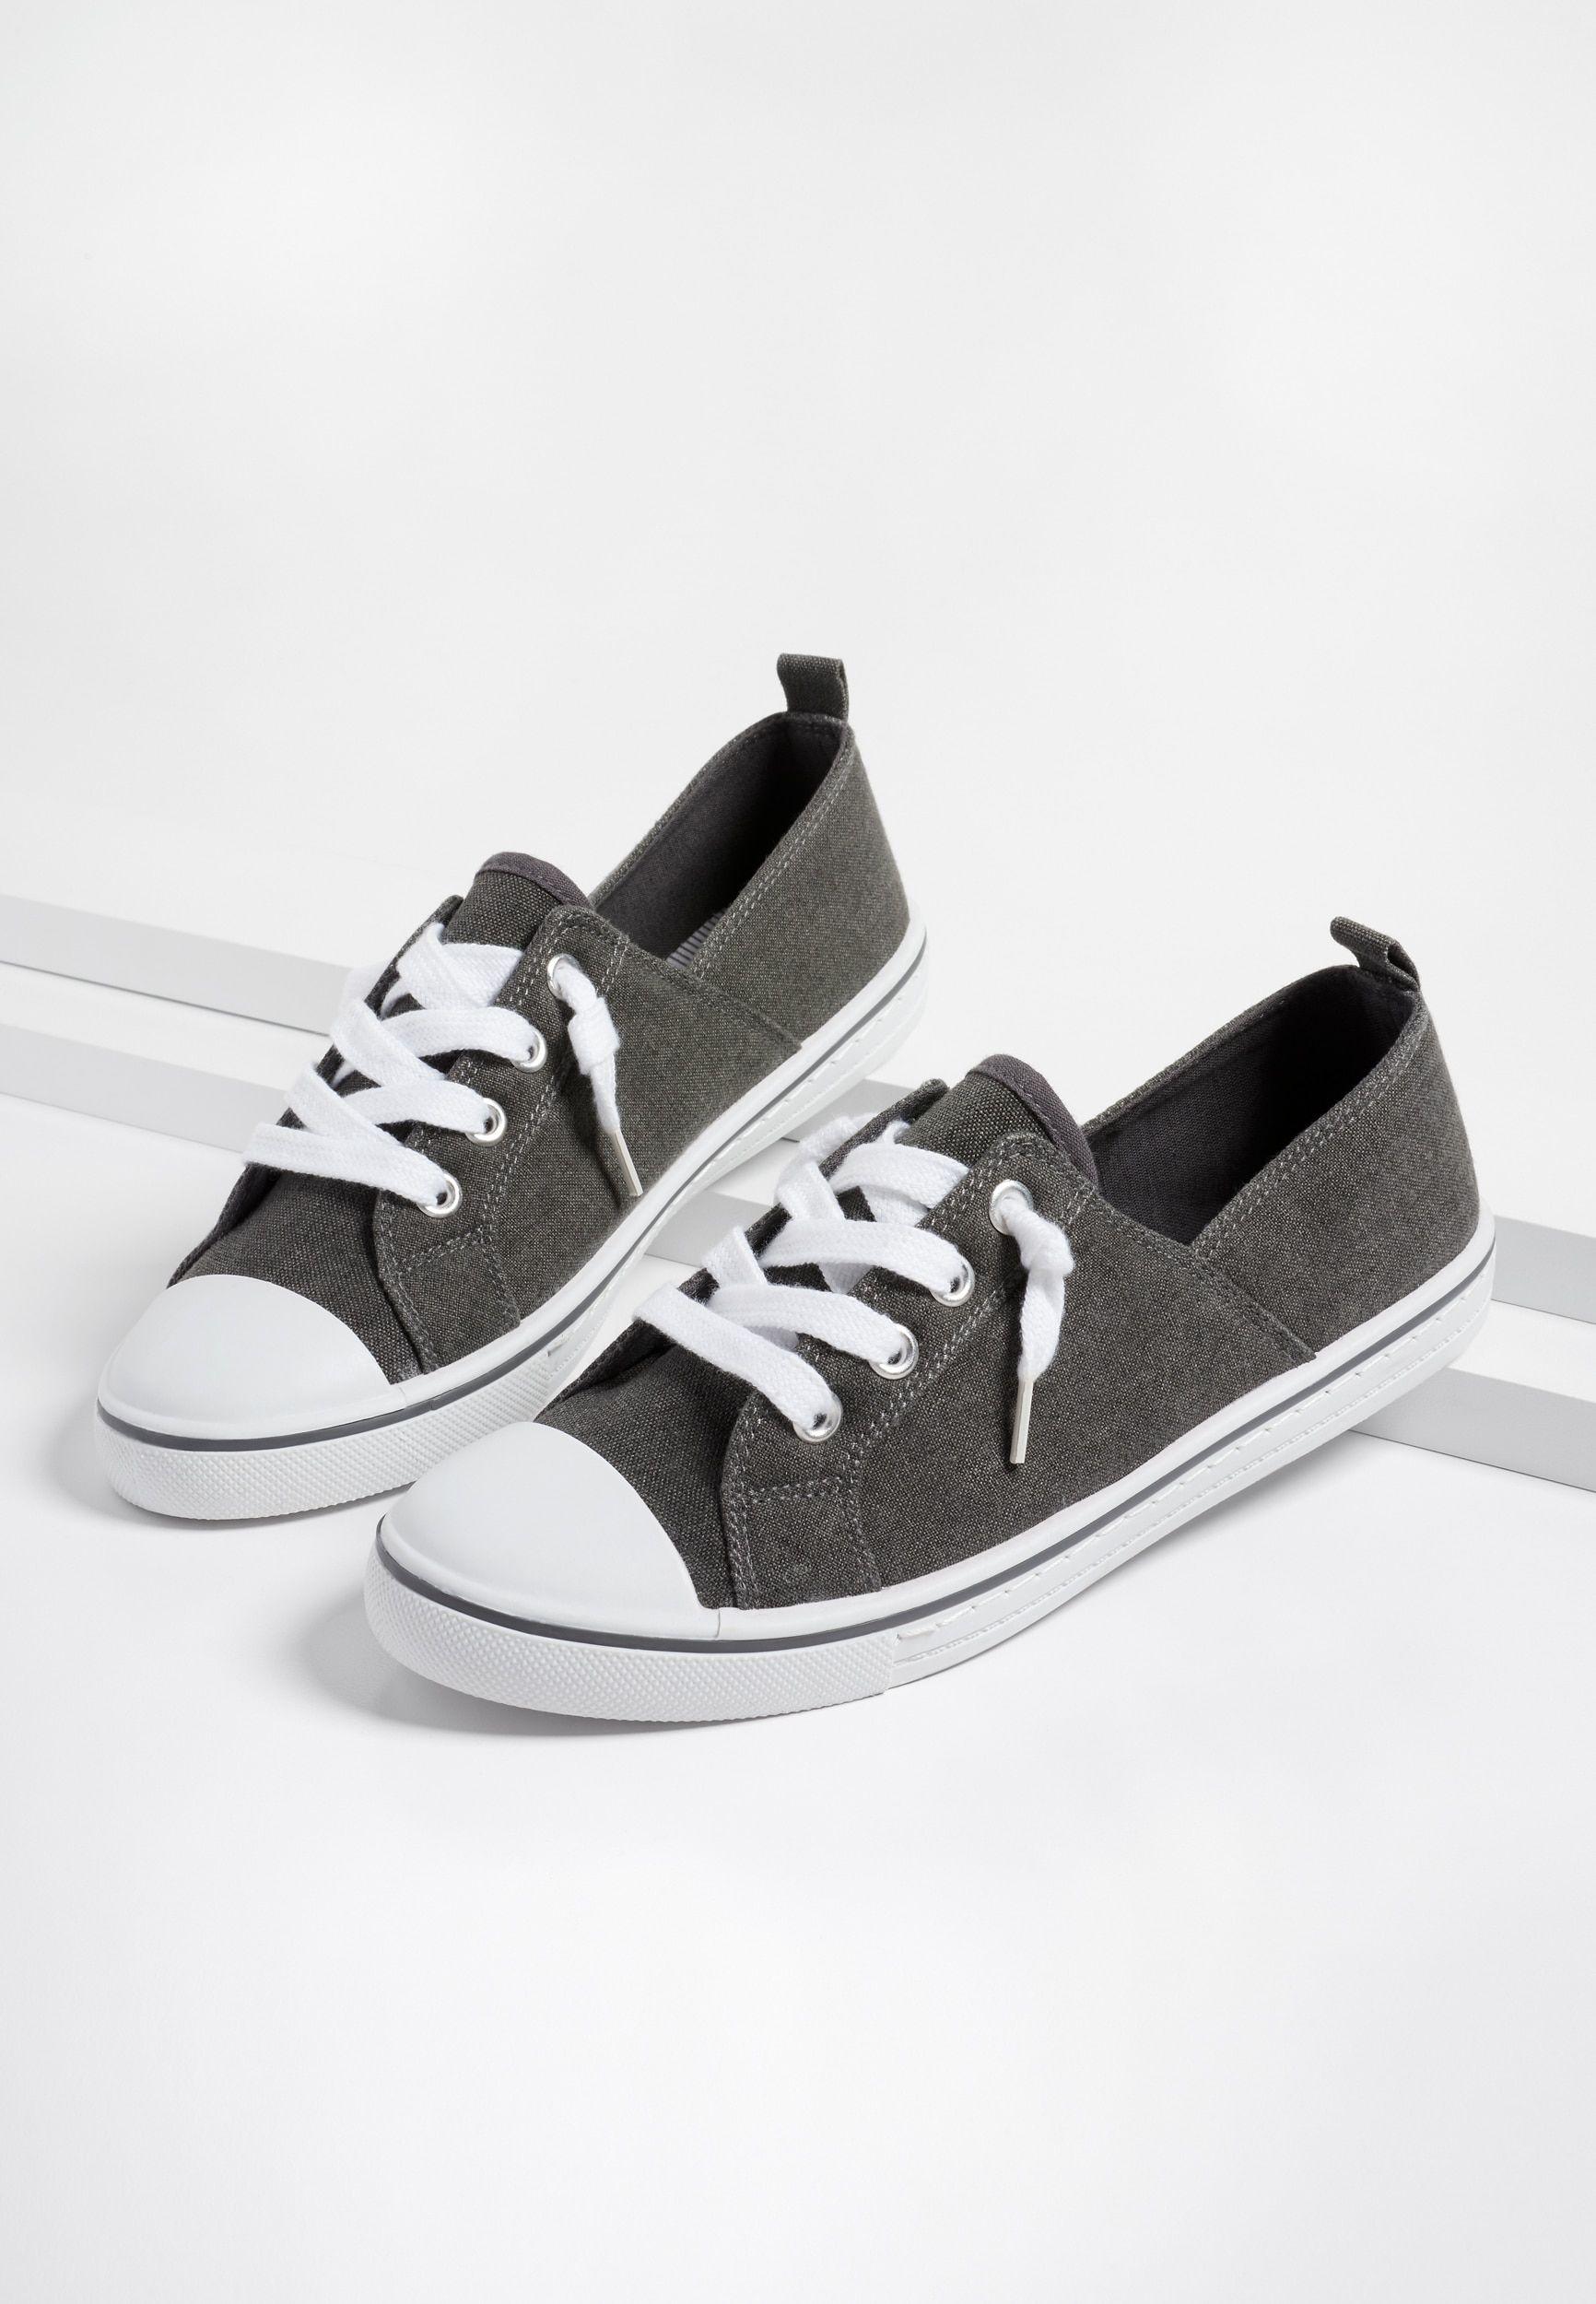 Maurices Womens Gia Slip On Sneaker